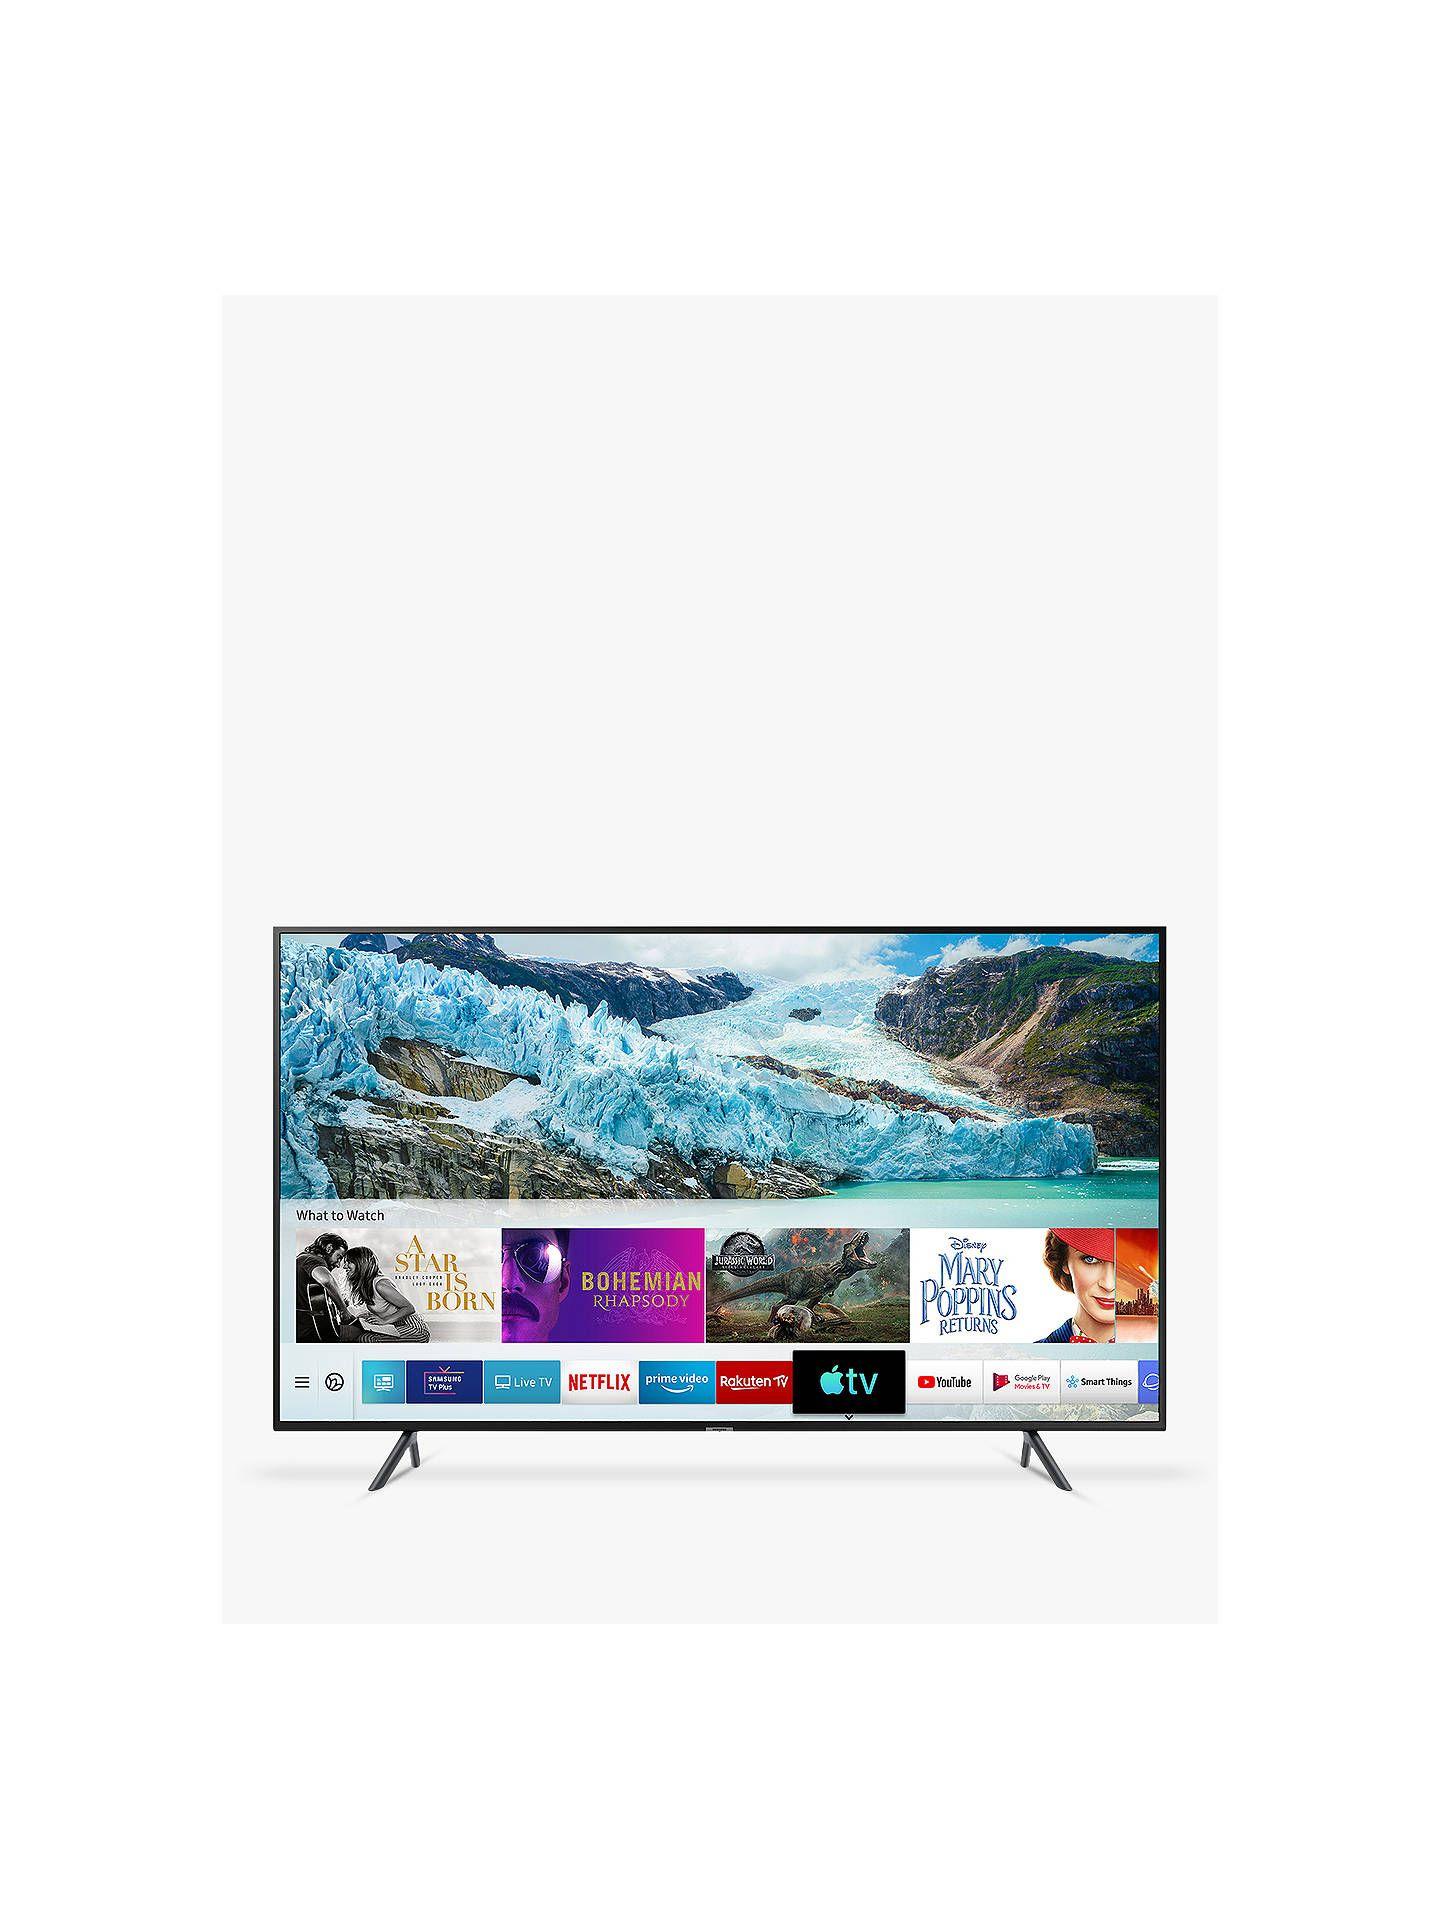 Samsung UE55RU7100 (2019) HDR 4K Ultra HD Smart TV, 55